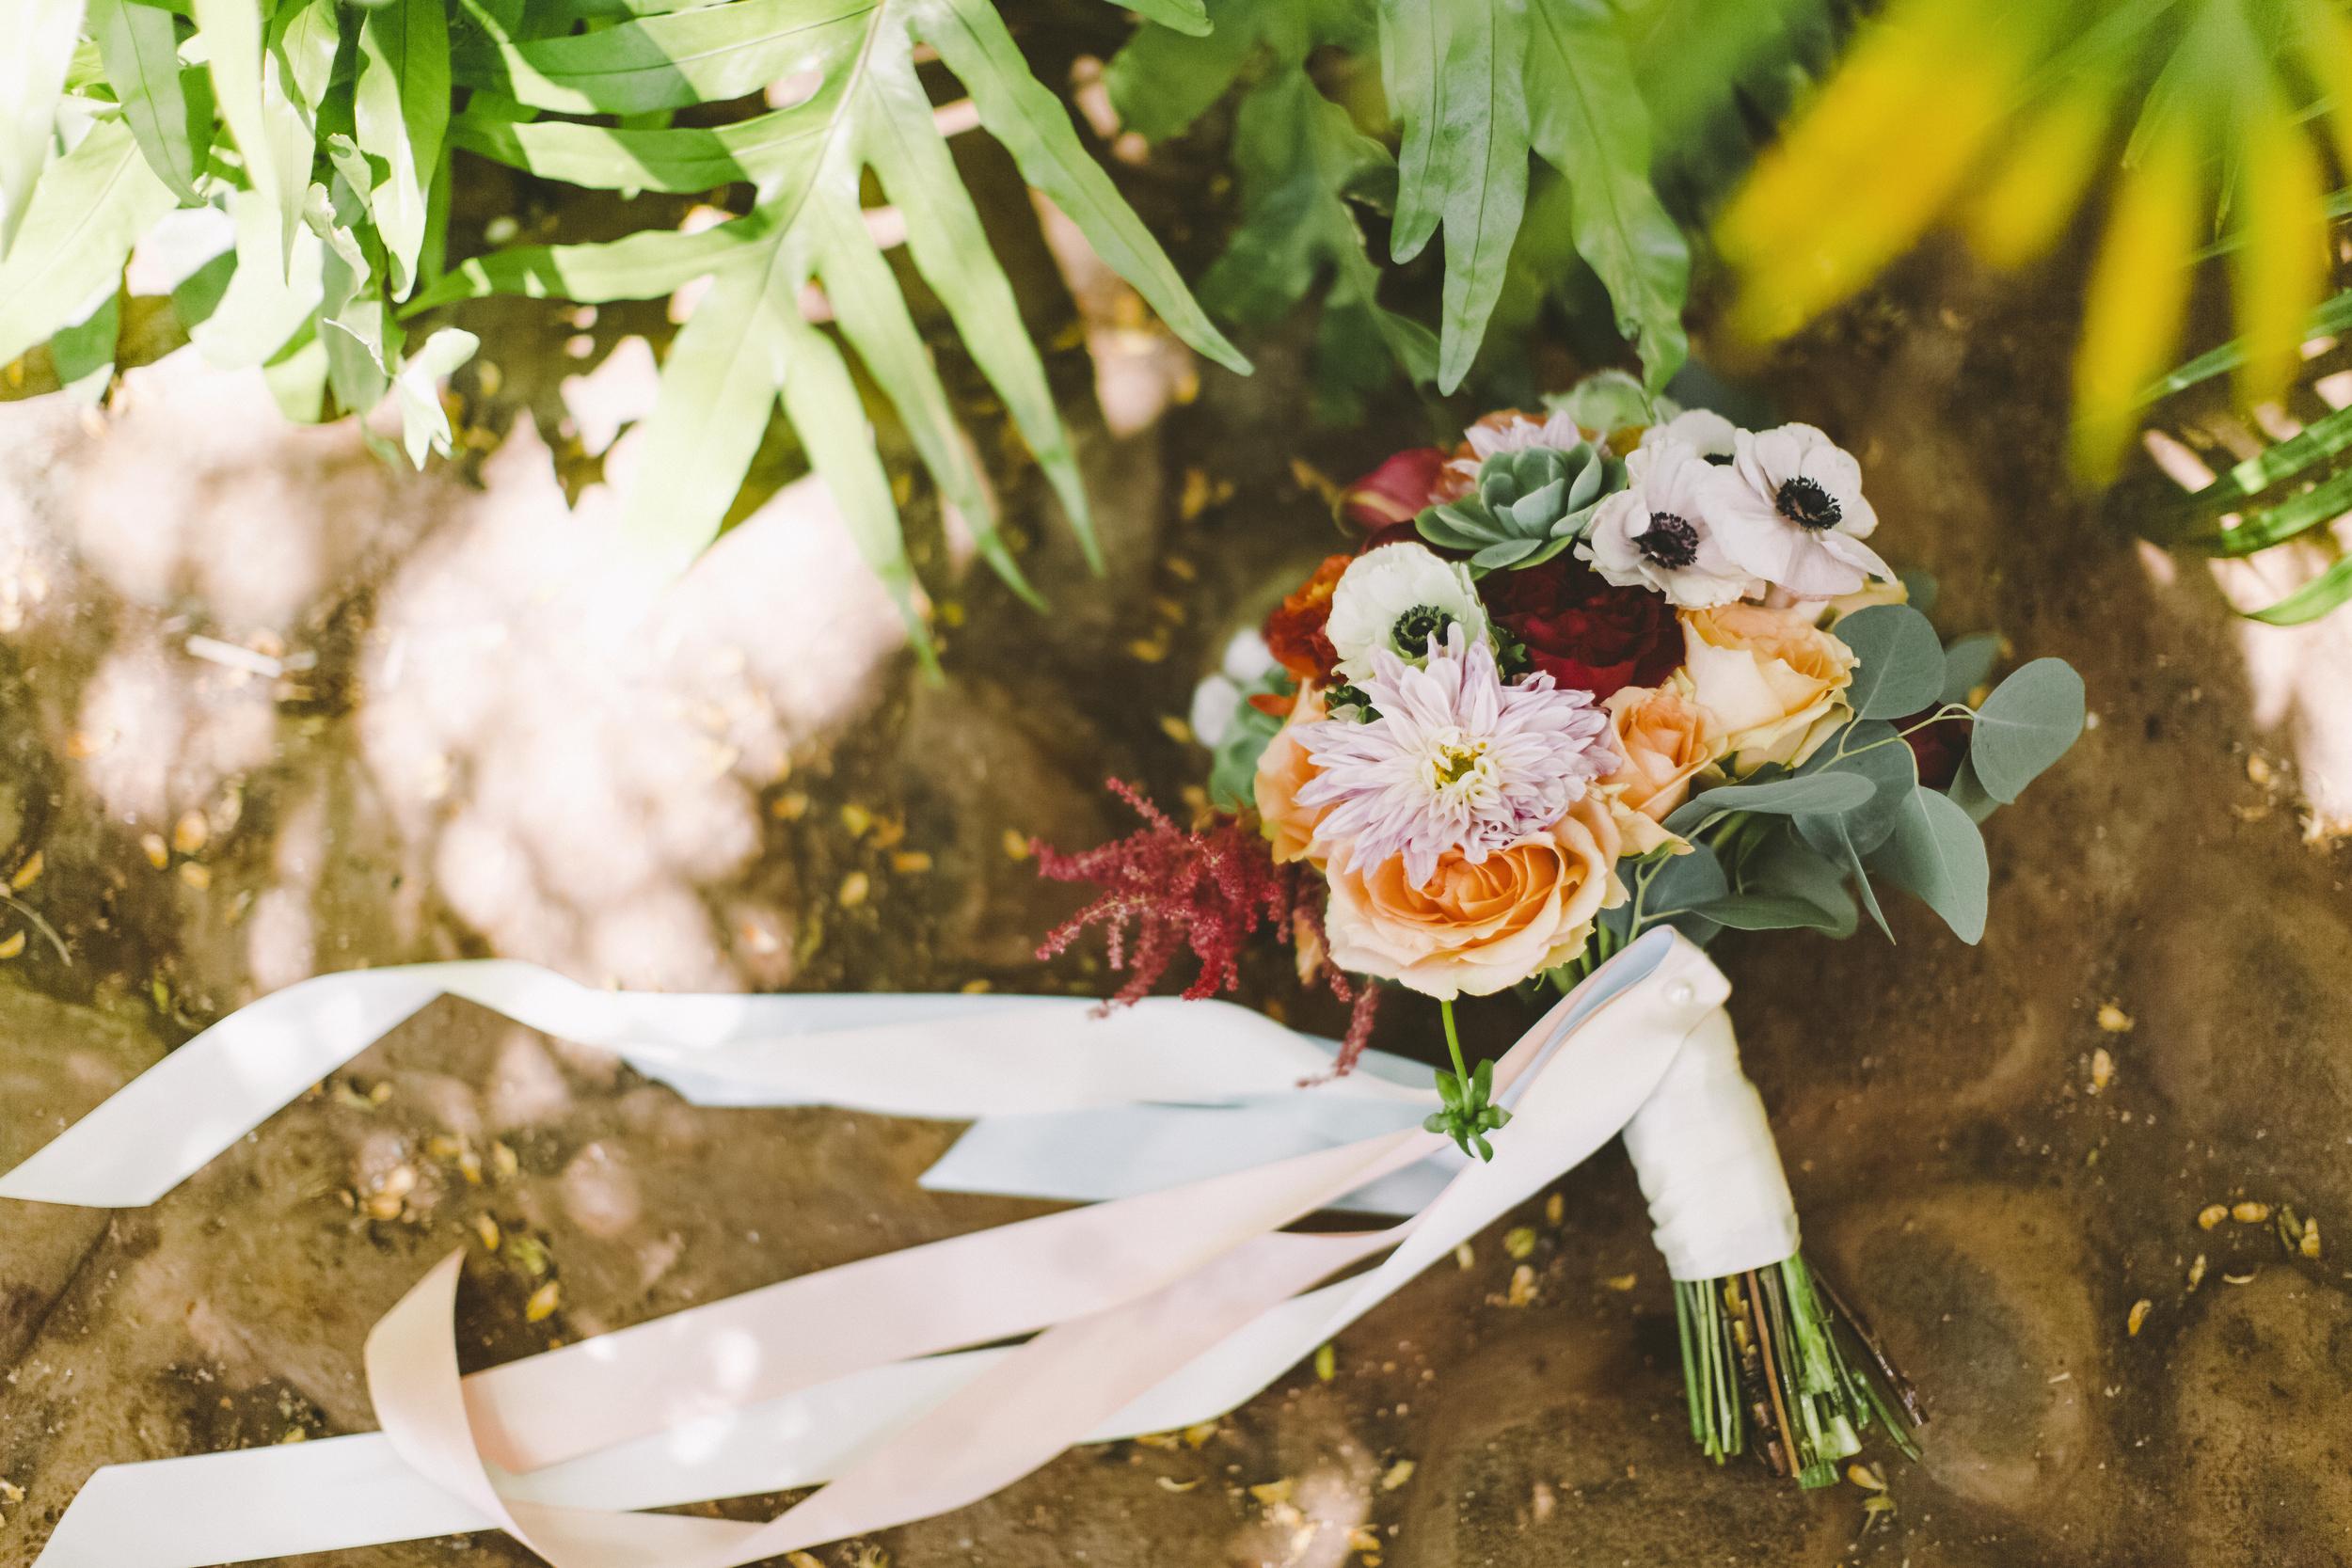 angie-diaz-photography-maui-wedding-mel-matt-08.jpg